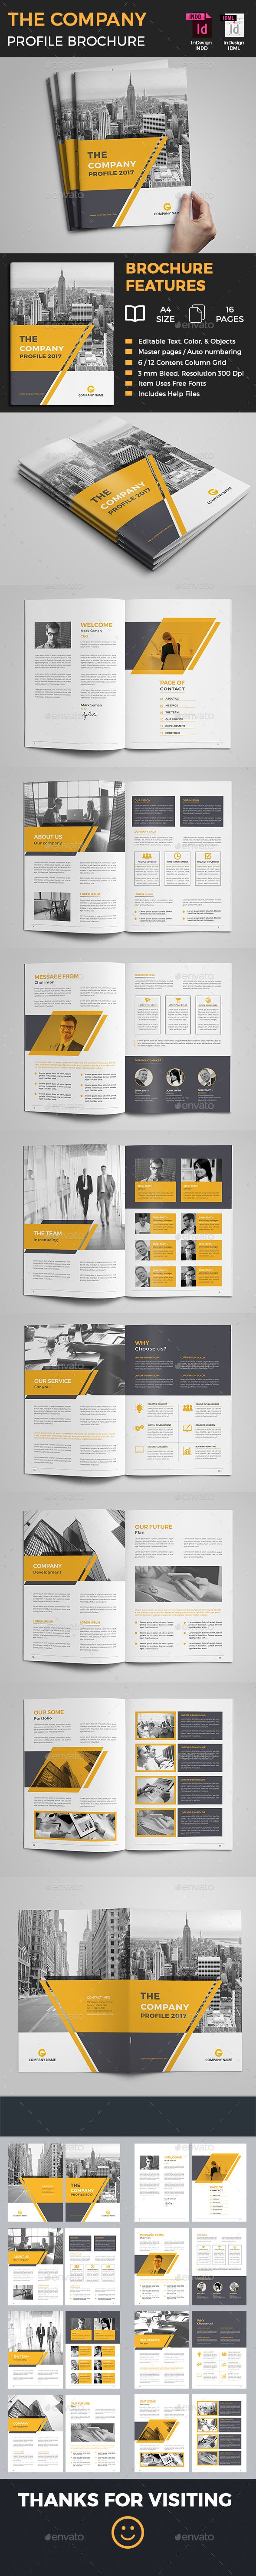 #Company #Profile #Brochure - Corporate Brochures Download here: https://graphicriver.net/item/company-profile-brochure/20354022?ref=alena994